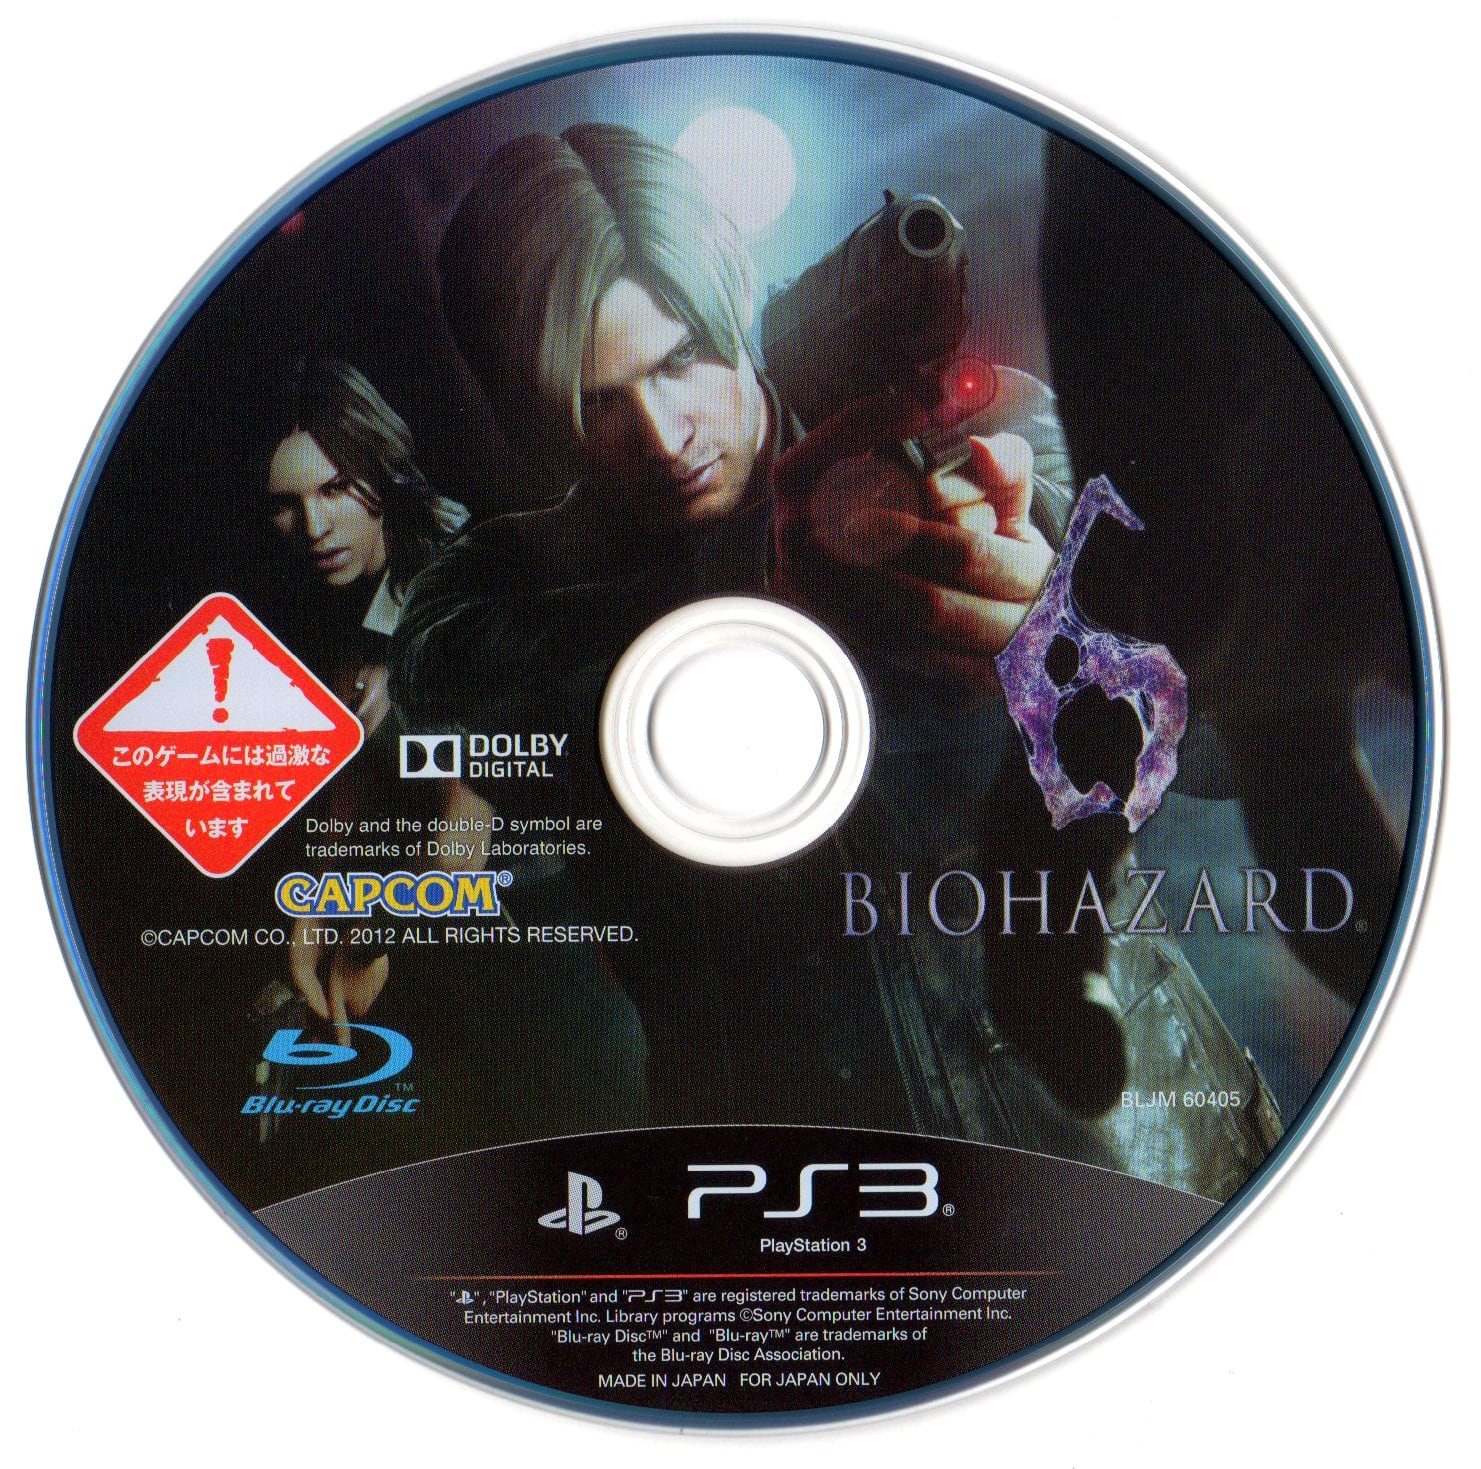 PS3「バイオハザード」シリーズ6作品のDL版が価 …